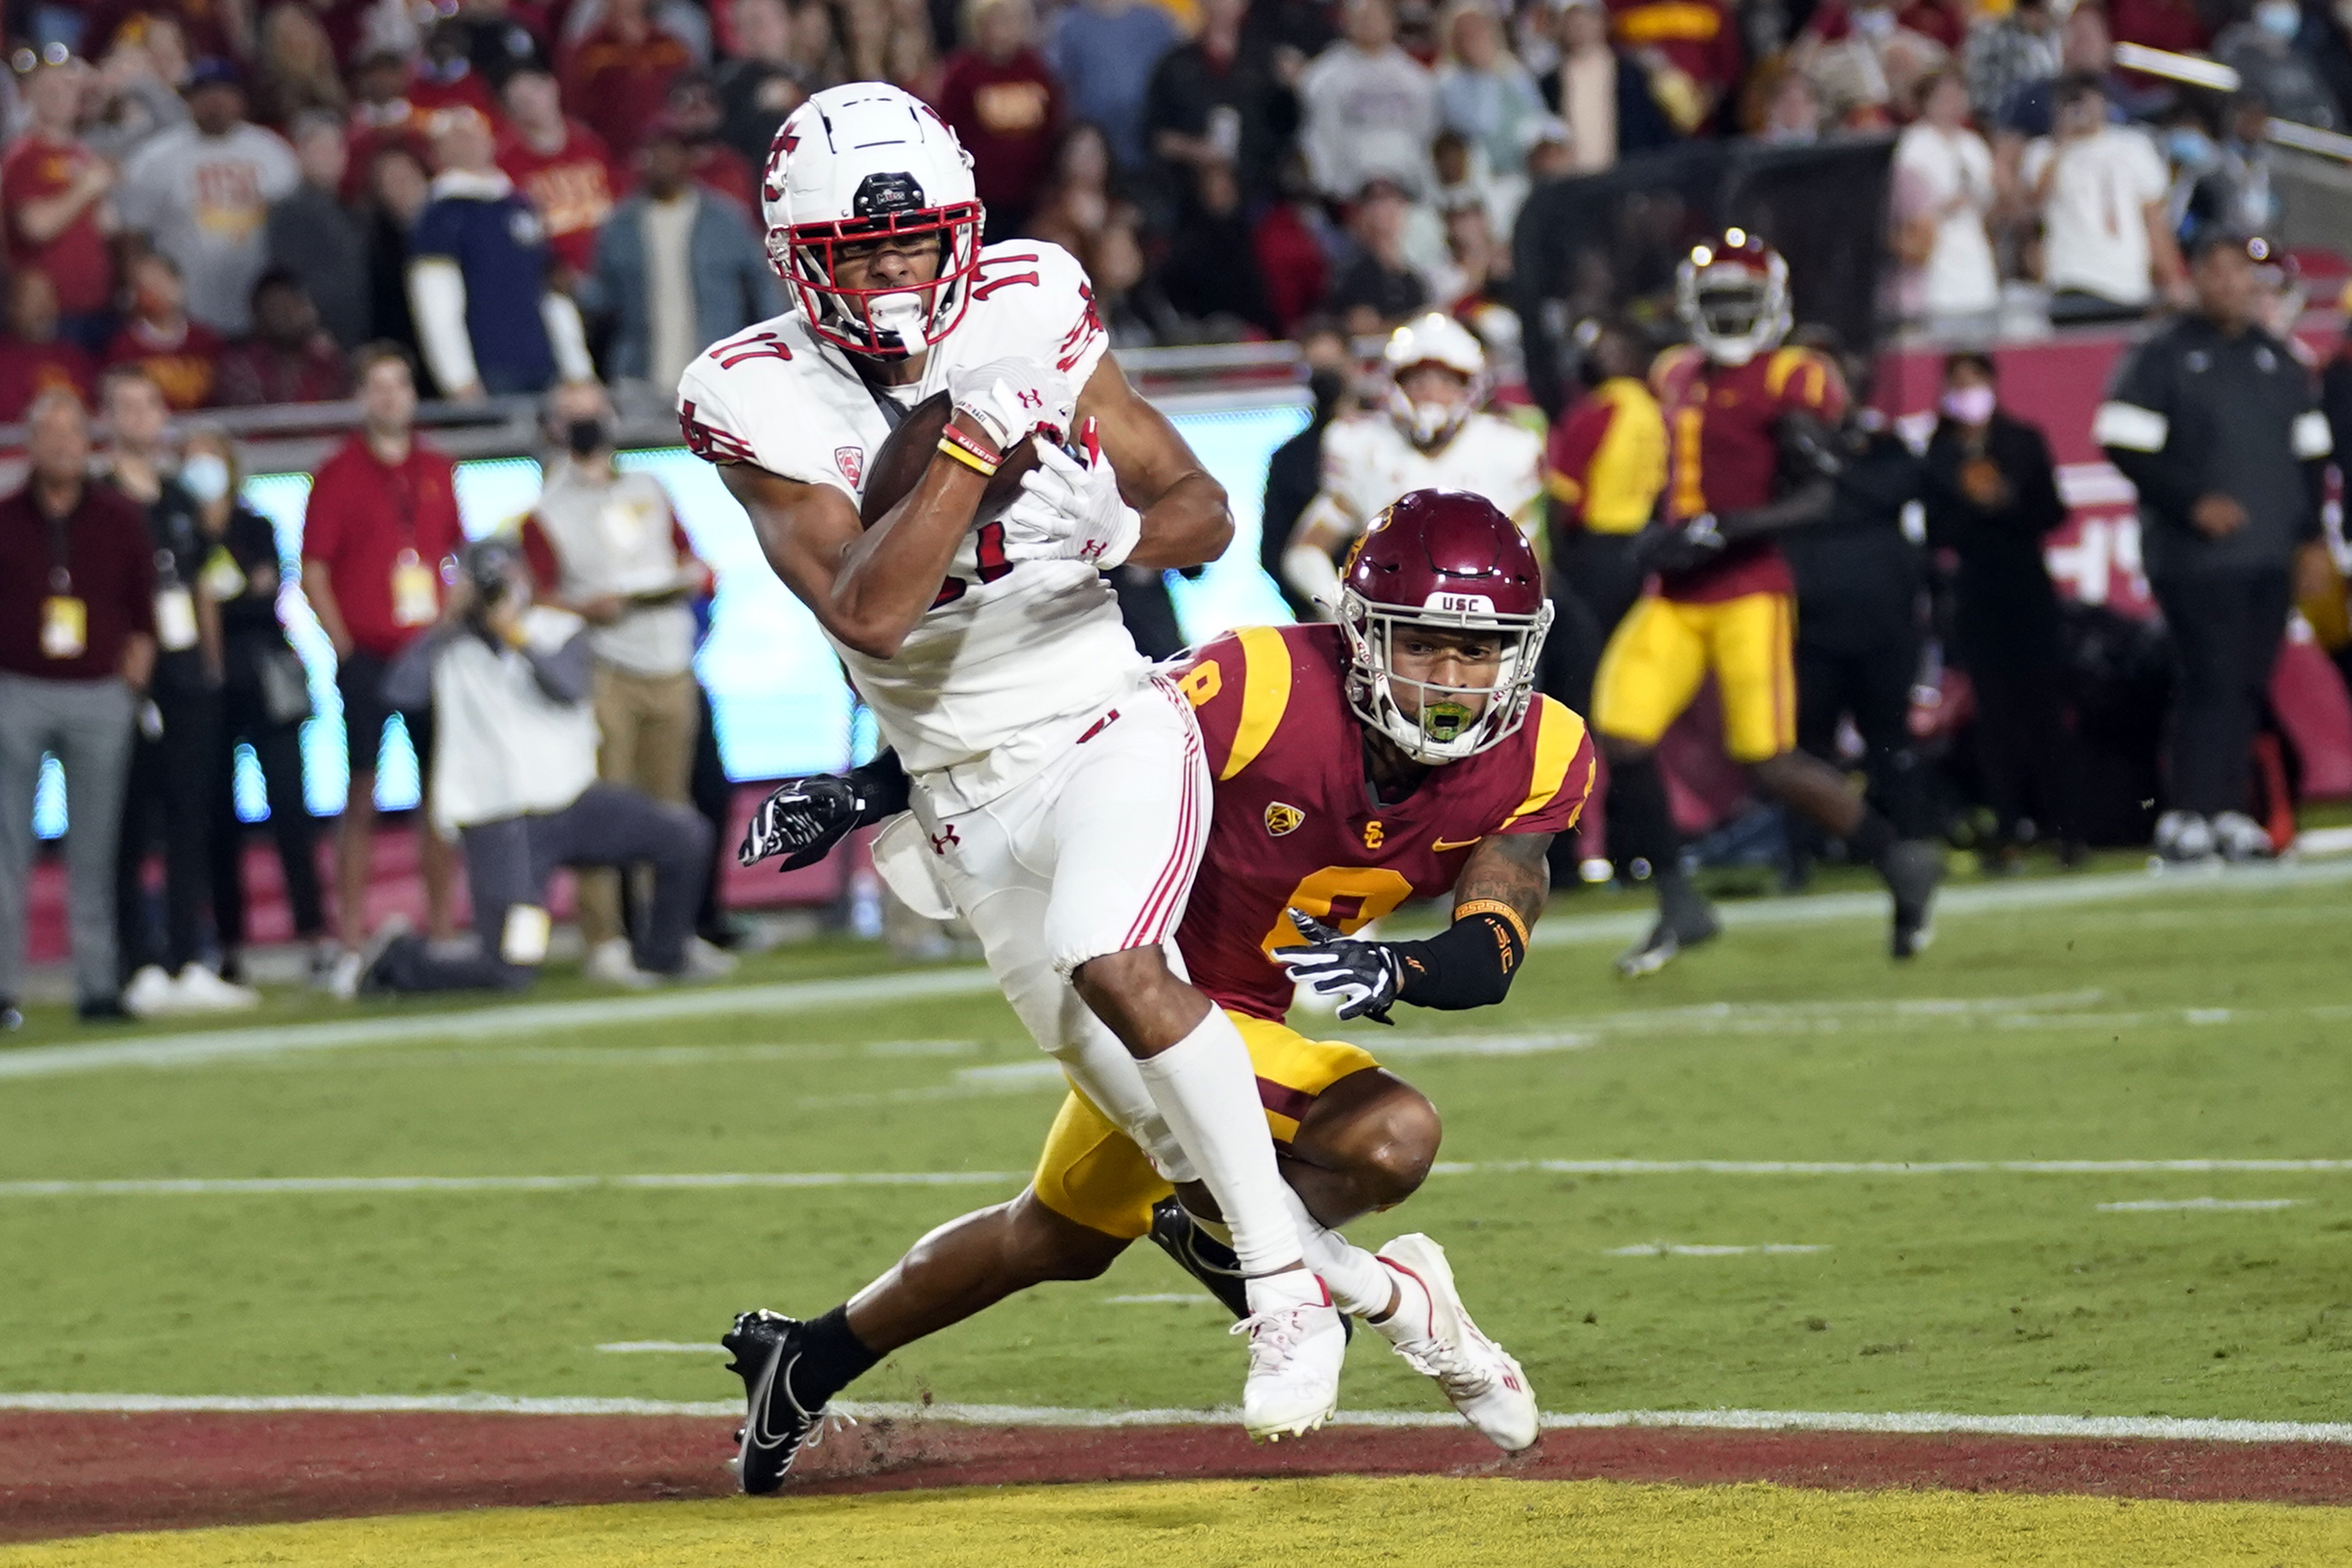 Utah wide receiver Devaughn Vele, left, makes a touchdown catch past USC cornerback Chris Steele during game Oct. 9, 2021.